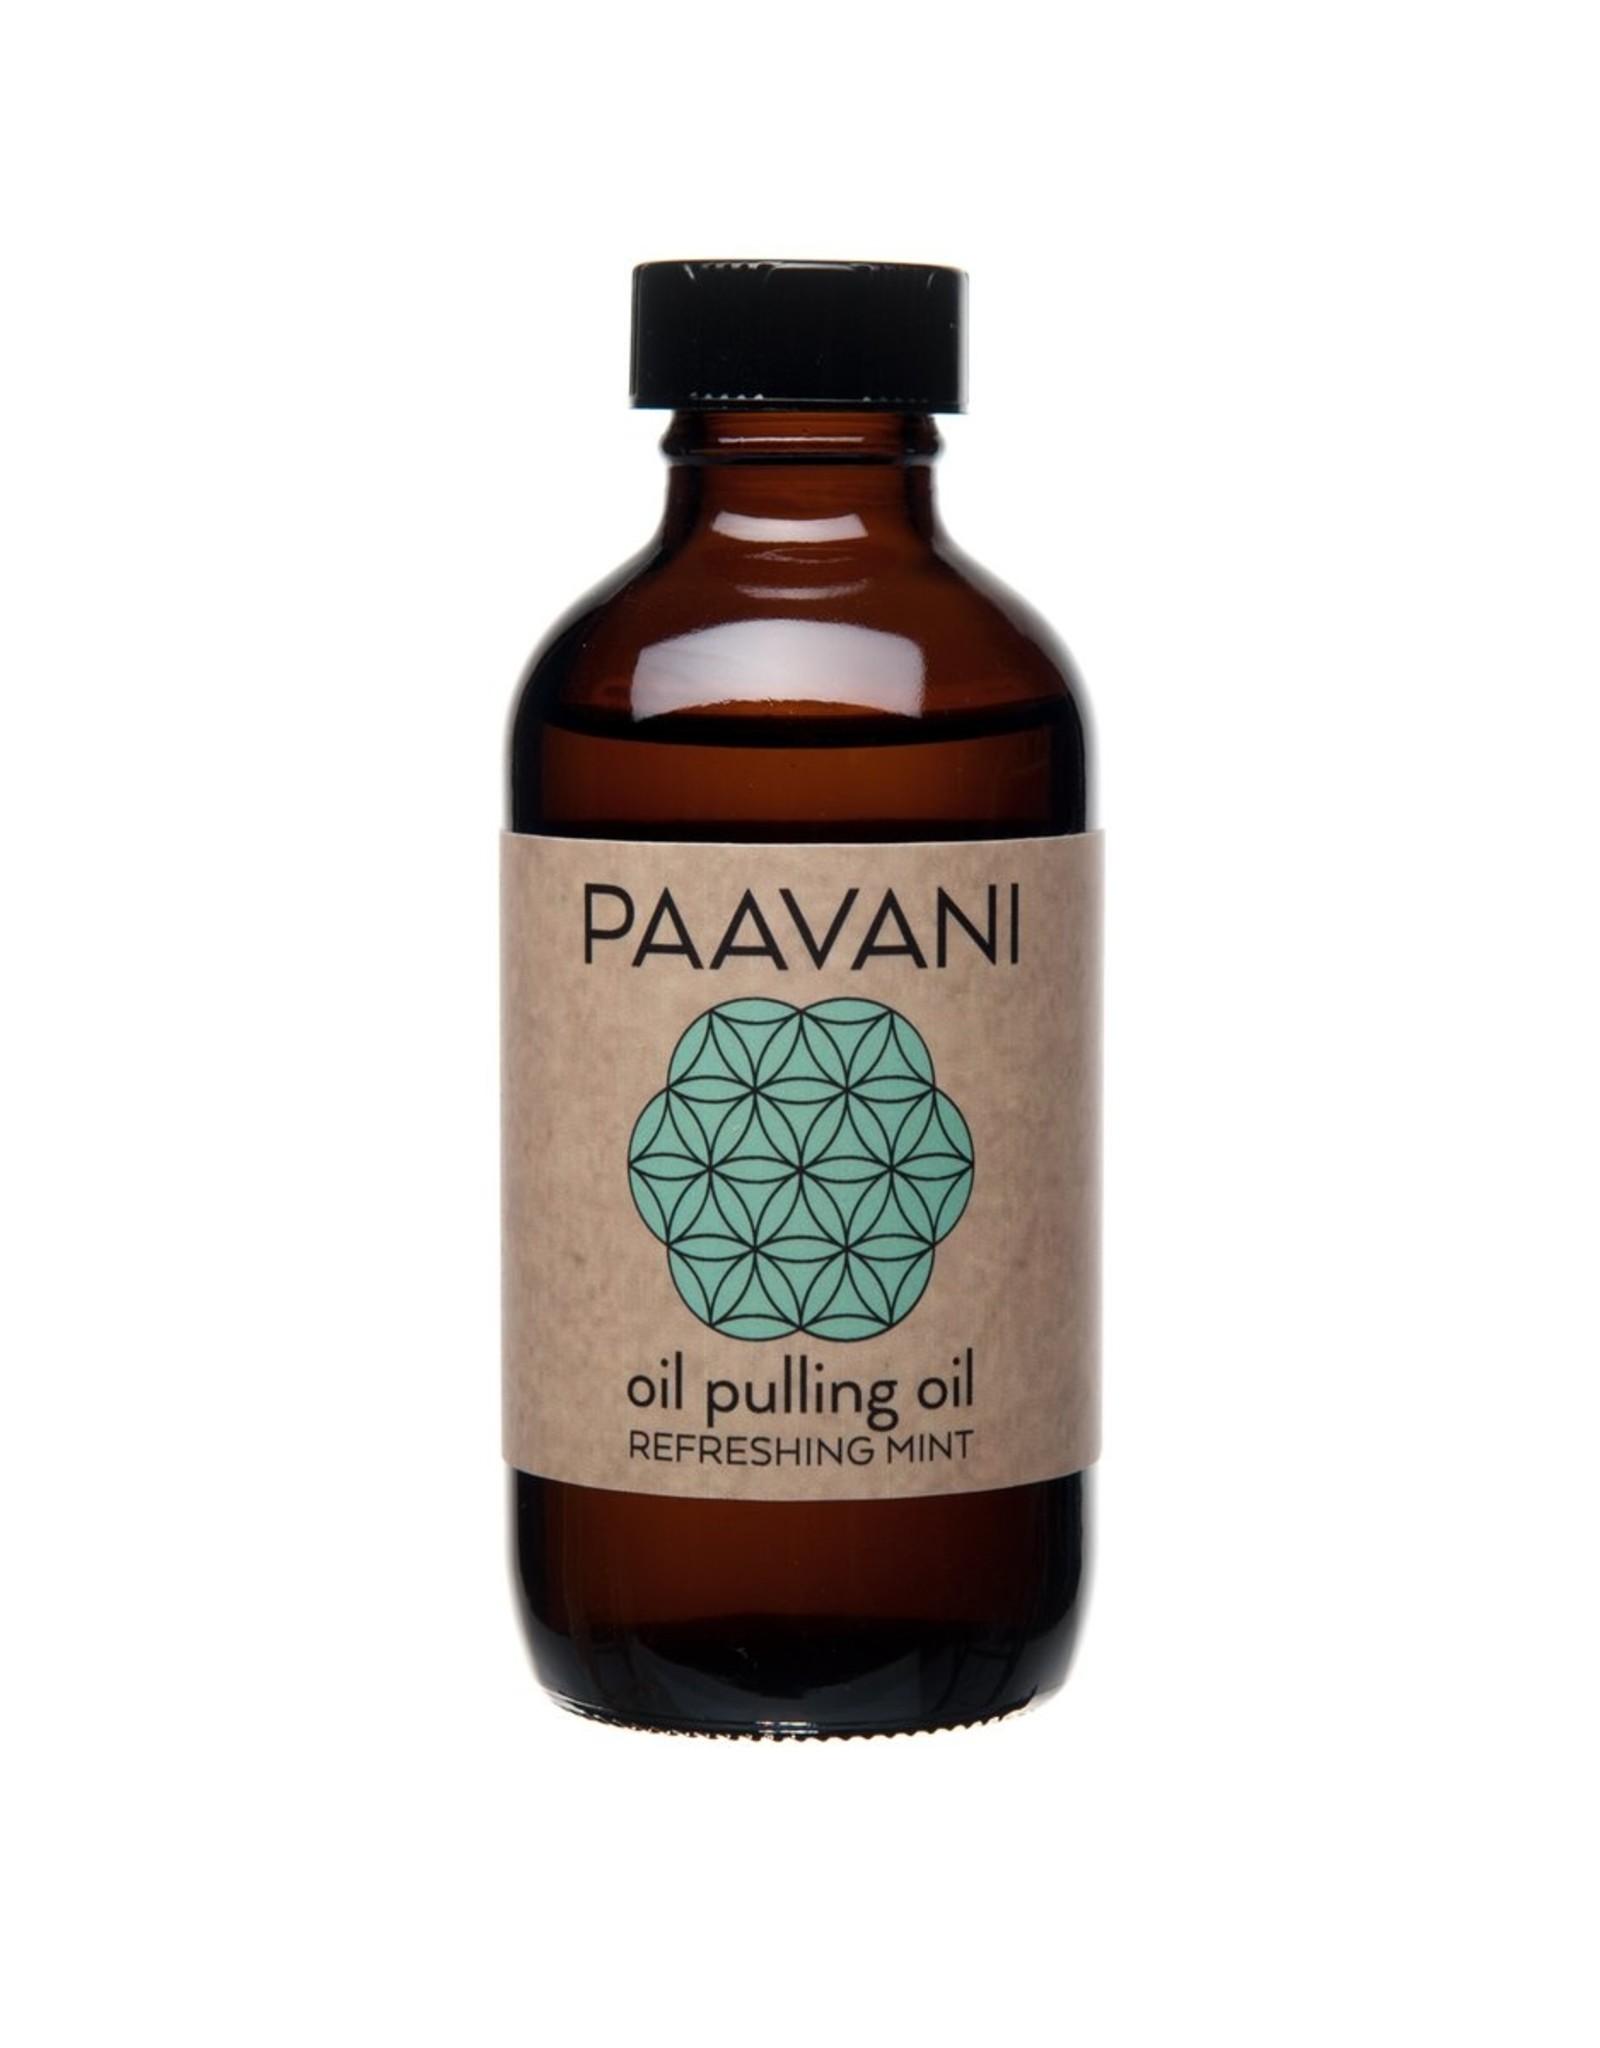 PAAVANI Ayurveda Refreshing Mint Pulling Oil 4oz